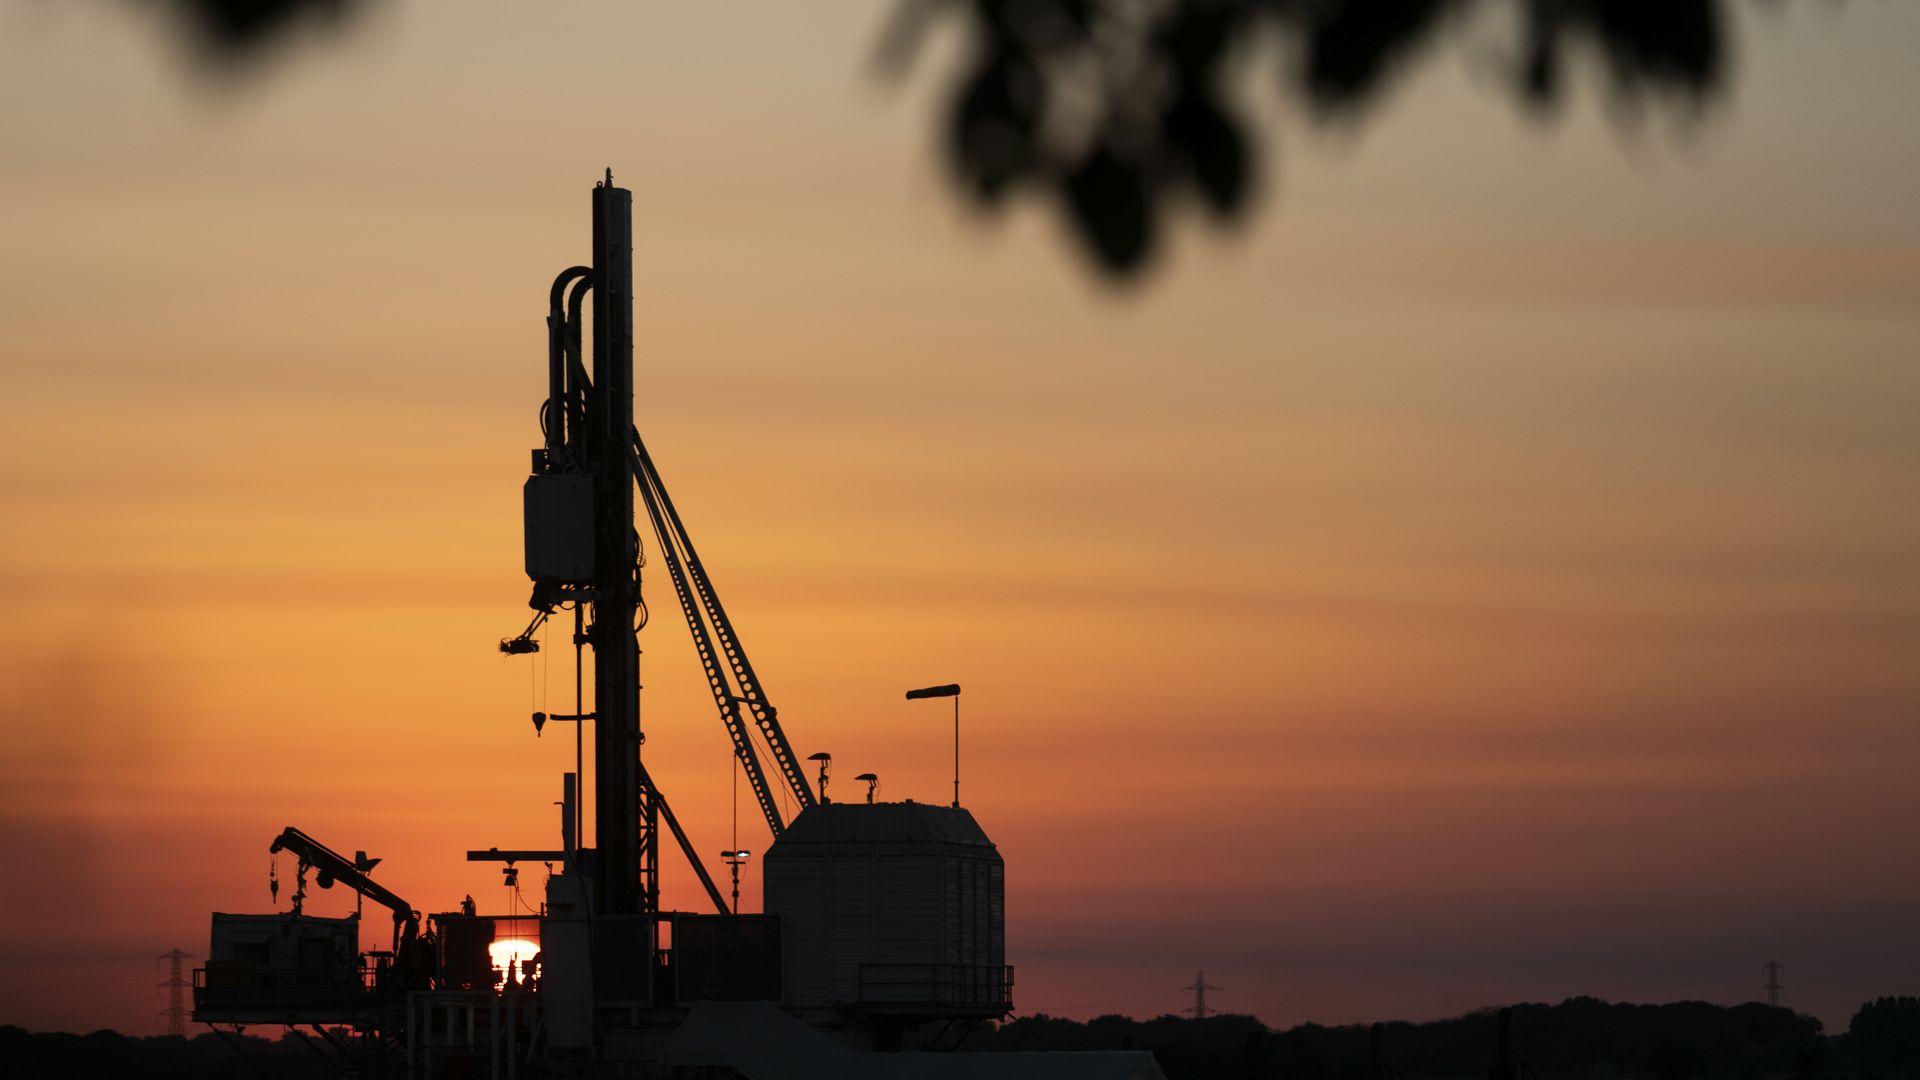 A fracking site.